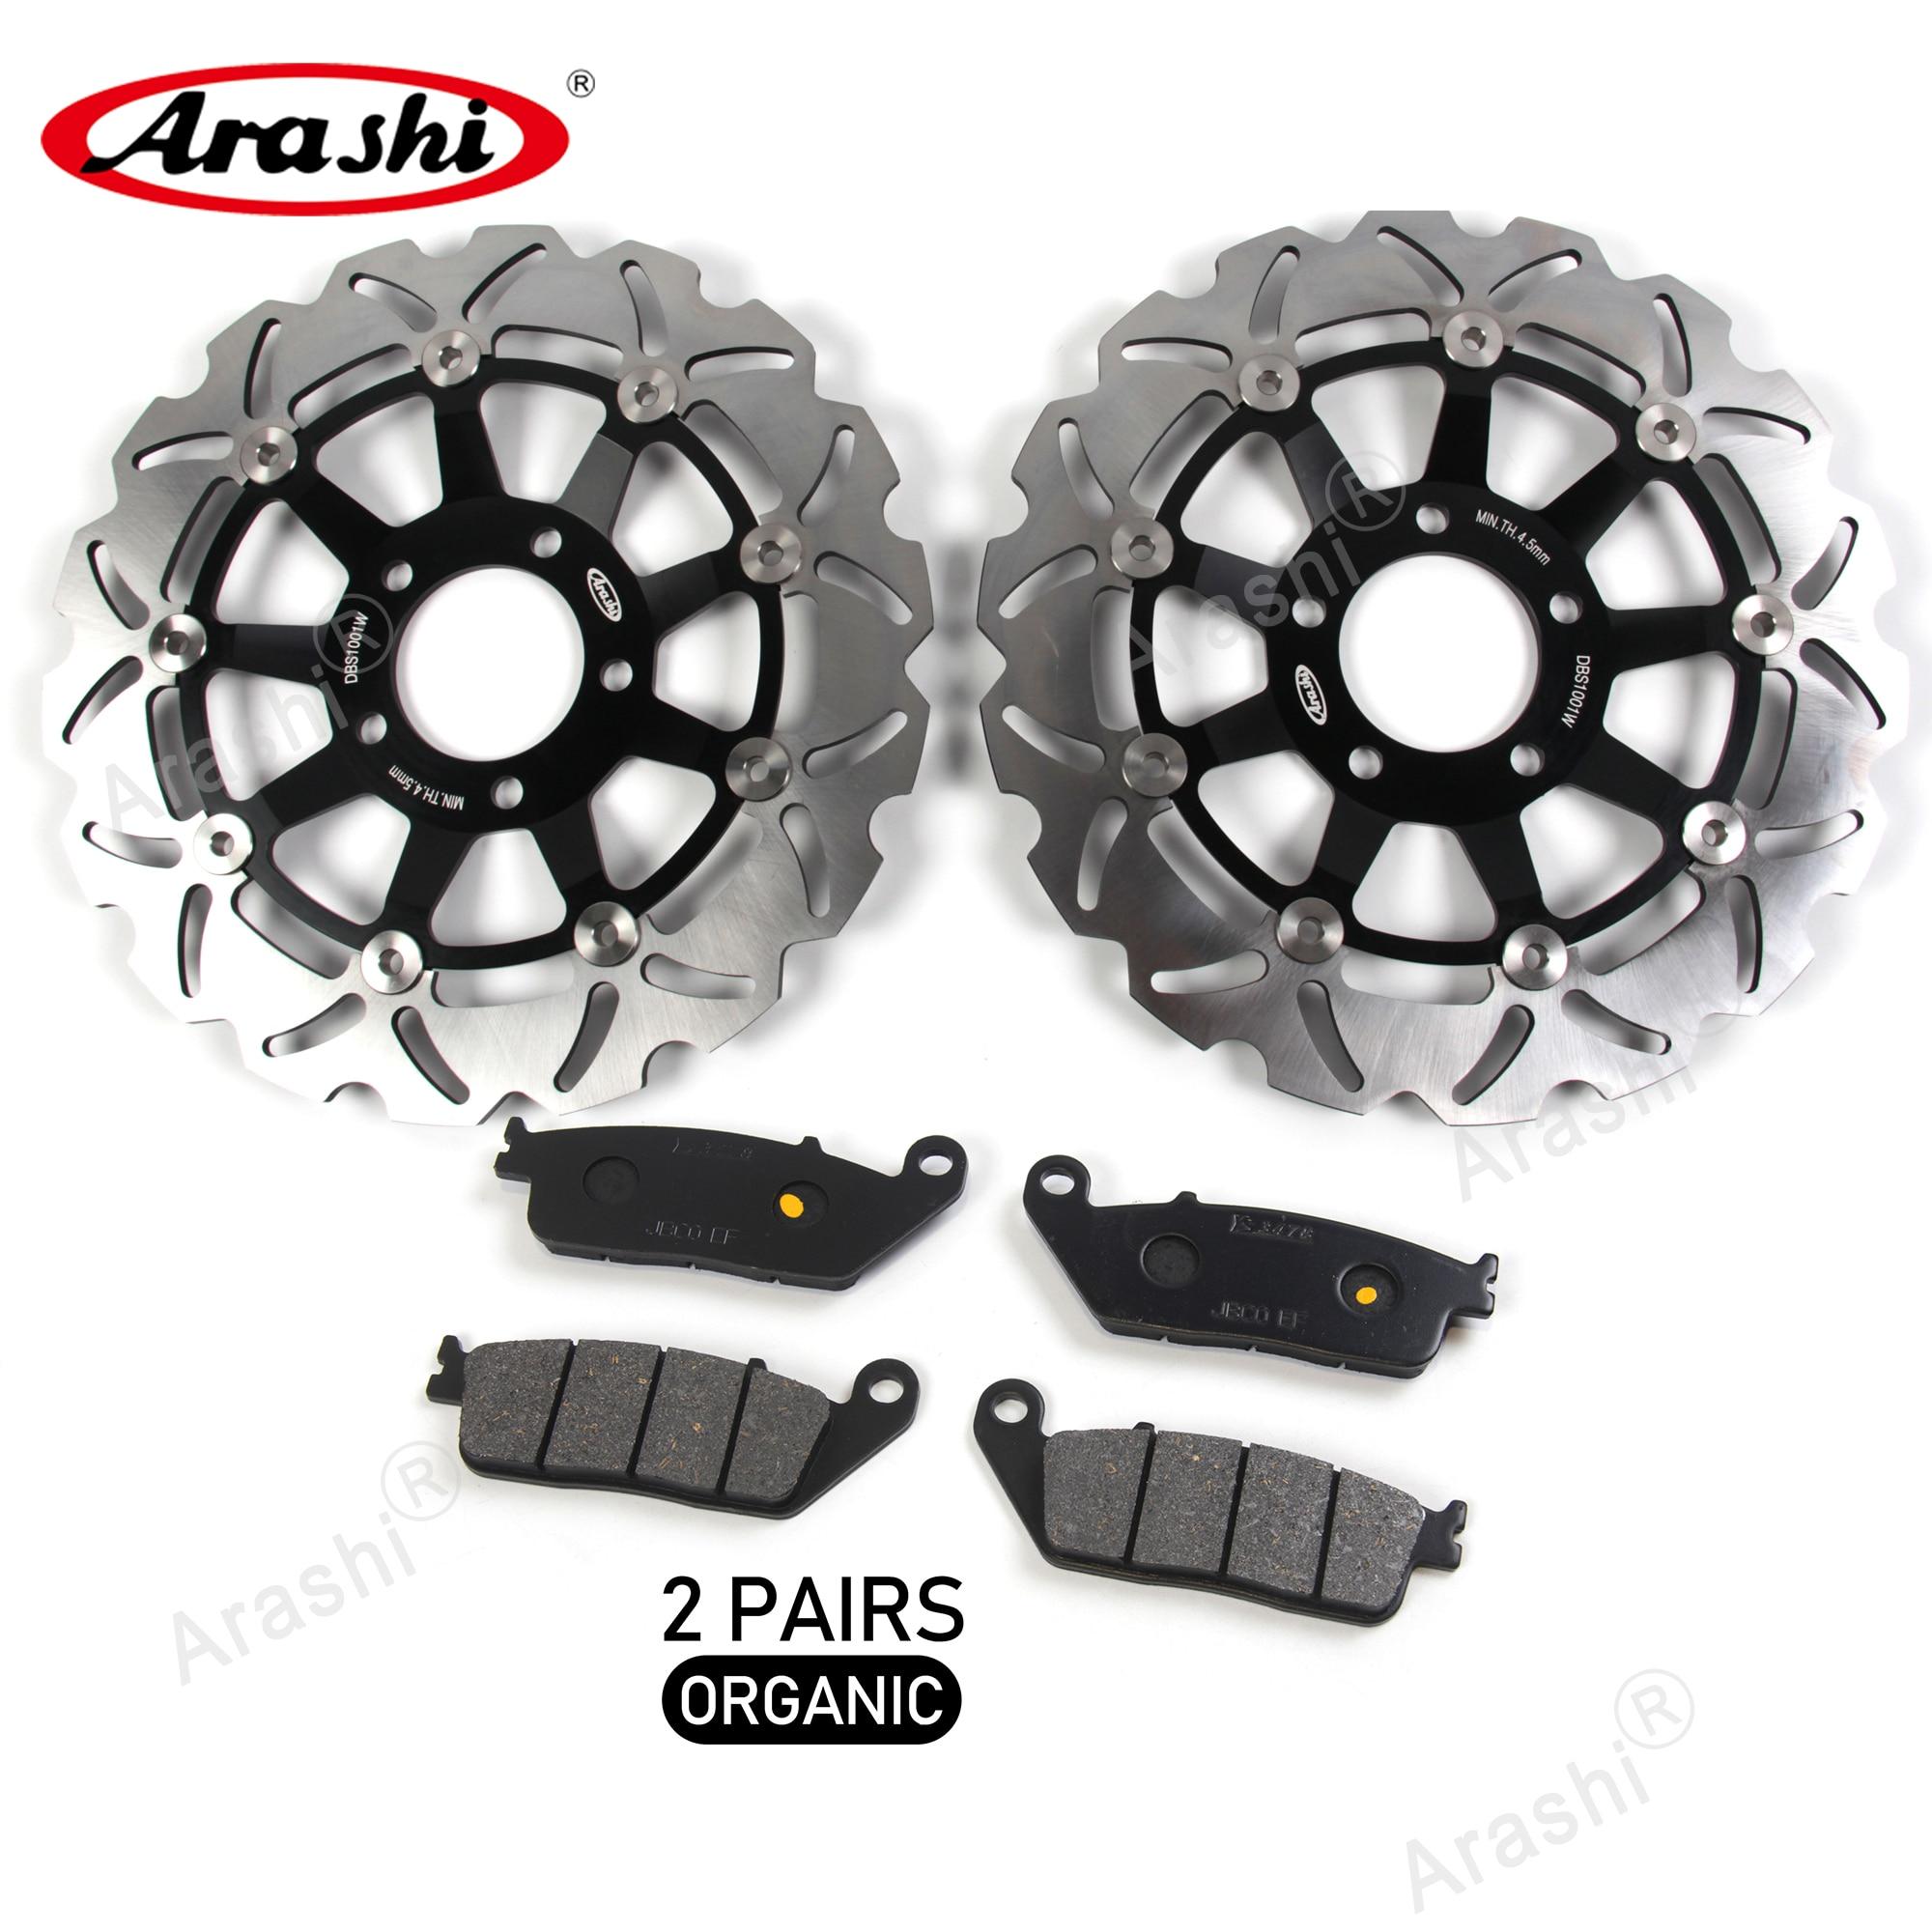 FOR SUZUKI DRZ400S DRZ400SM 2009-2013 2010 2011 2012 09 10 11 Aluminum radiator